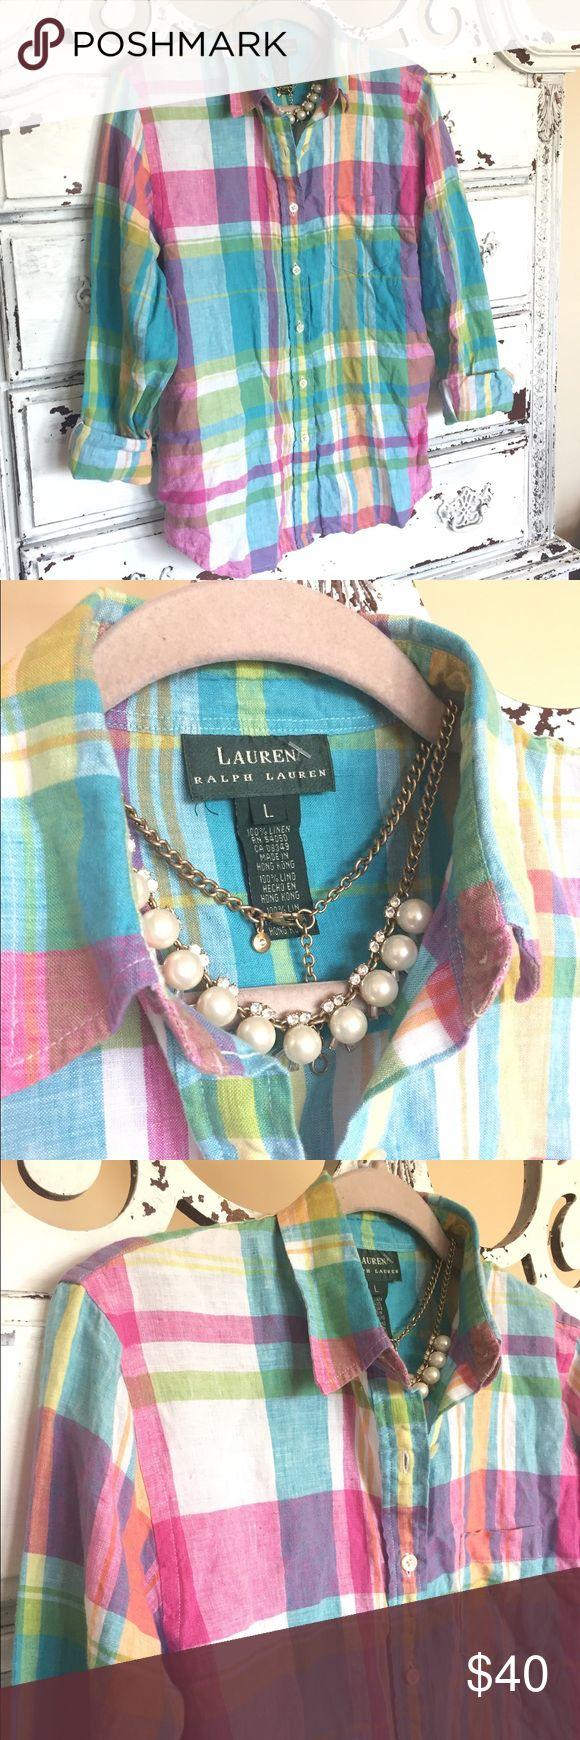 🌸💐☀️Ralph Lauren LRL preppy madras shirt🌸🌺☀️ Think spring ladies! Classic and pretty for spring/ Easter!! Lauren Ralph Lauren Tops Button Down Shirts